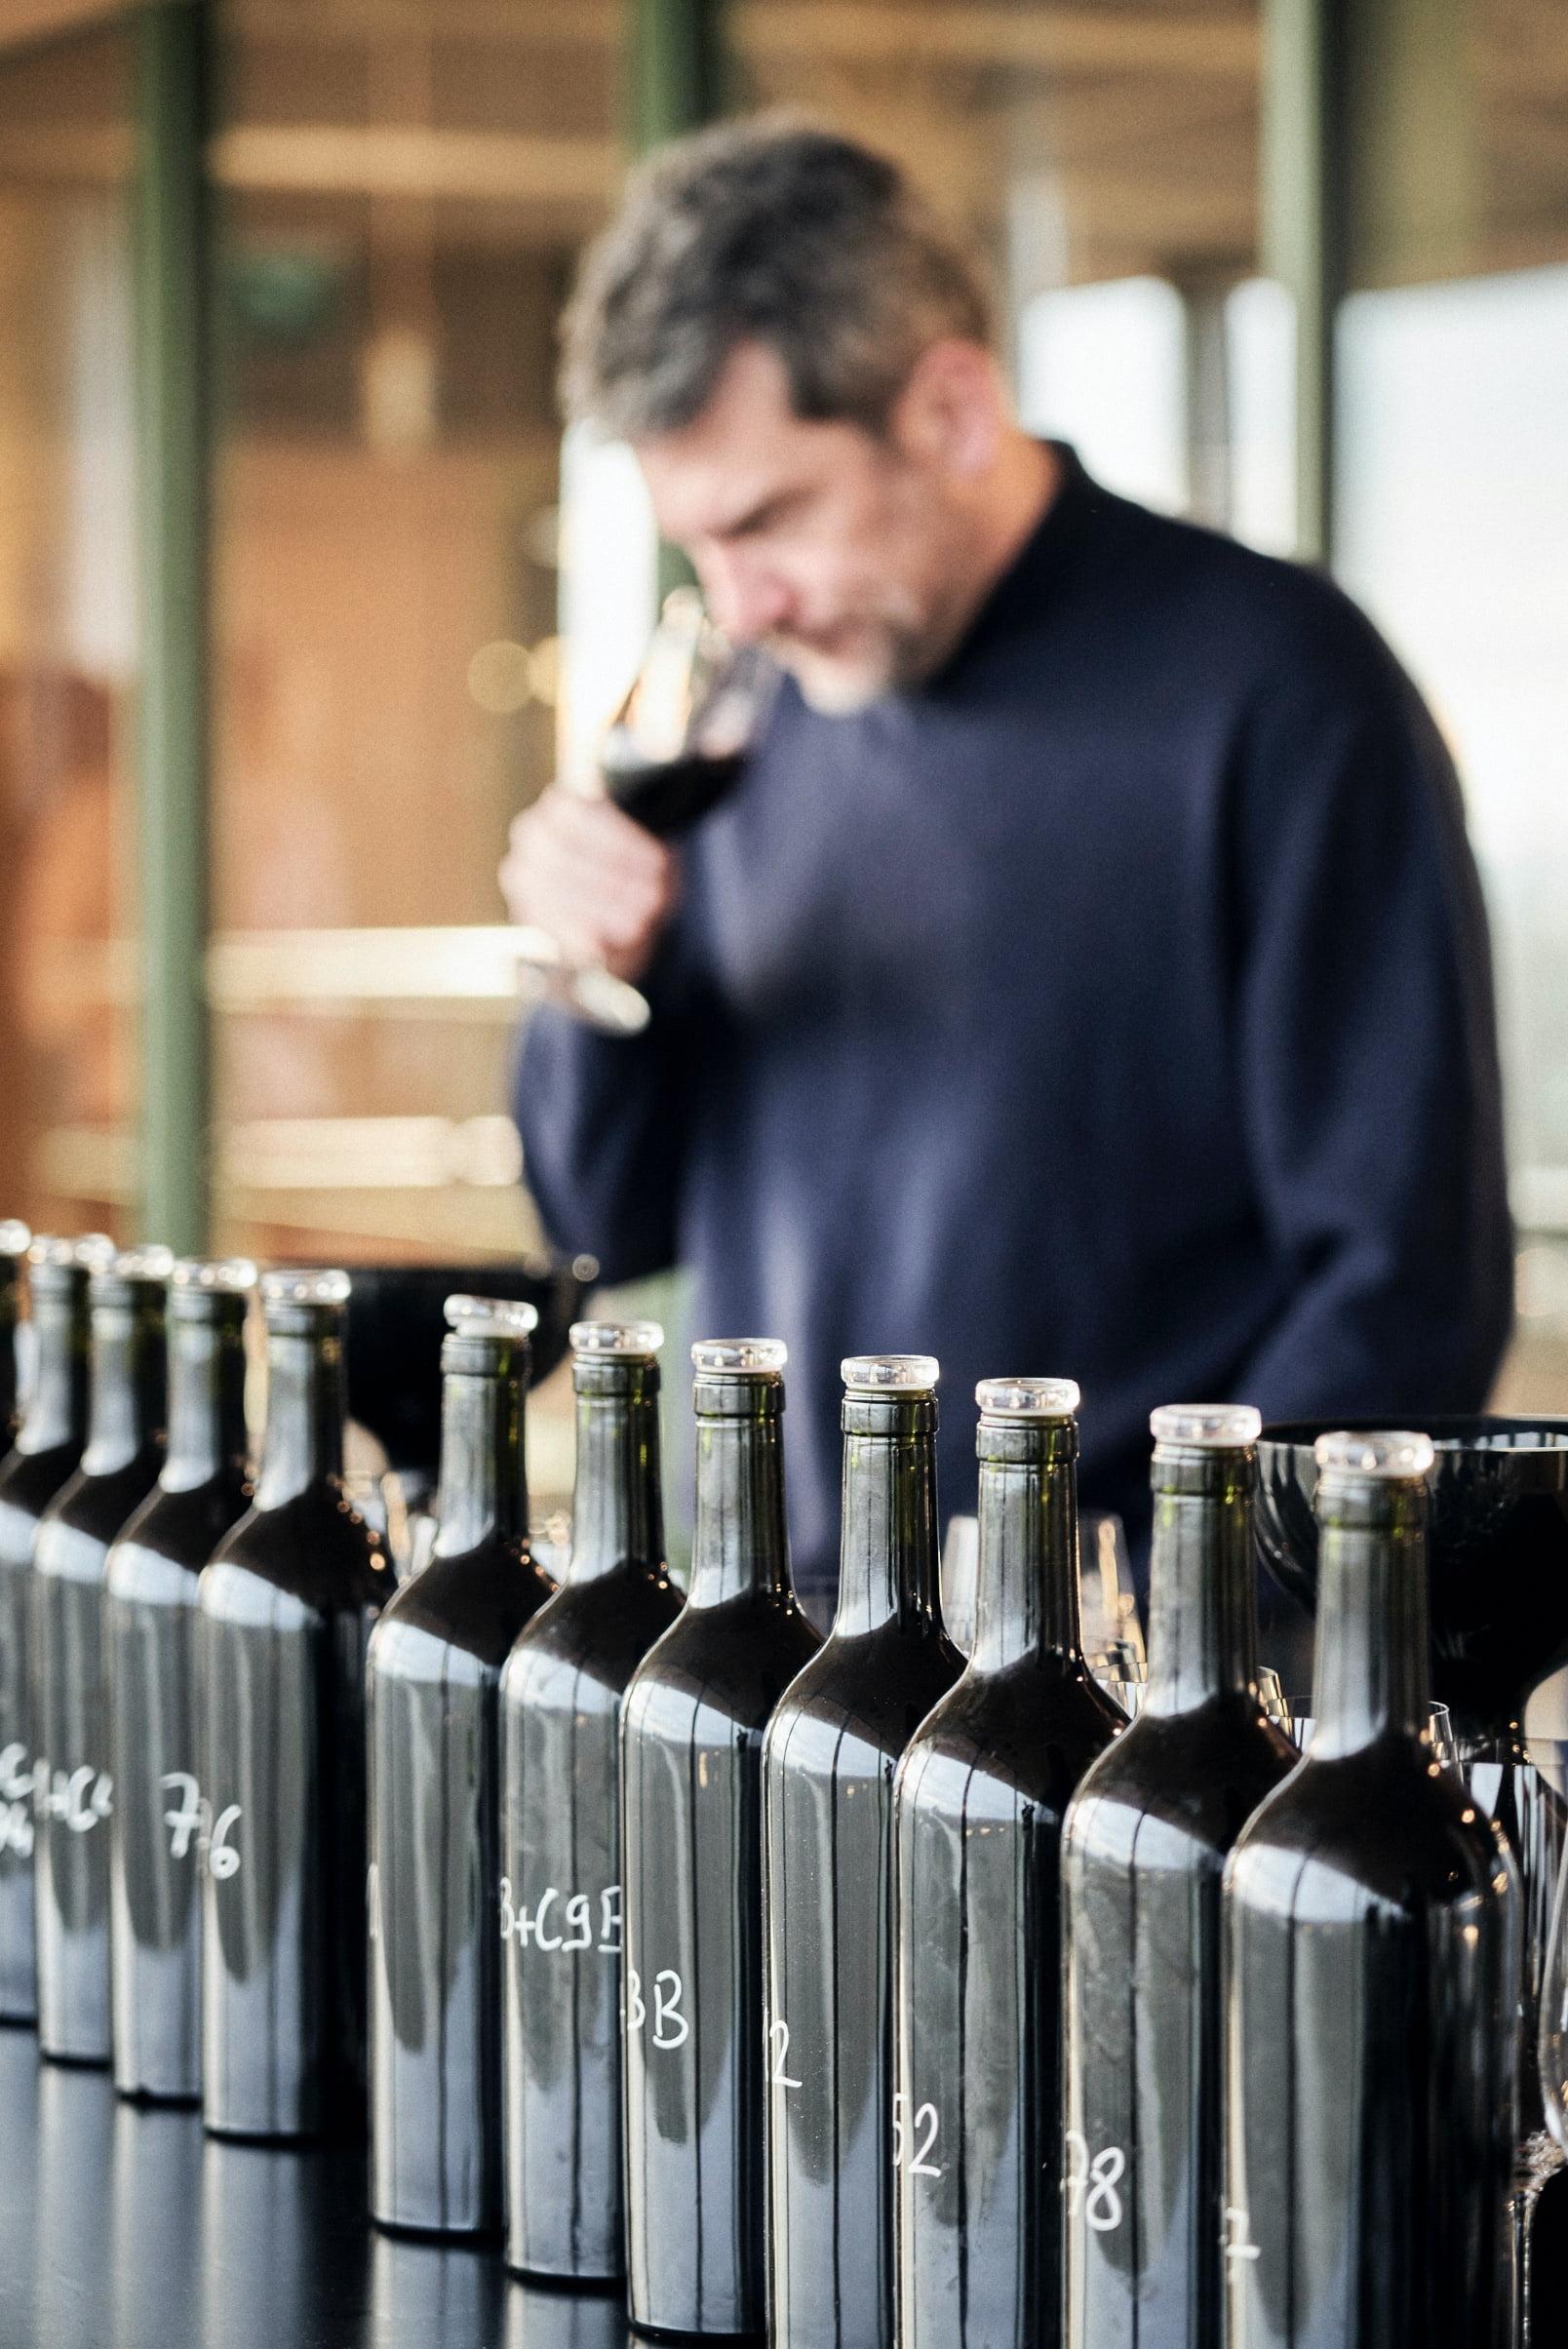 Blending great wine Pauillac